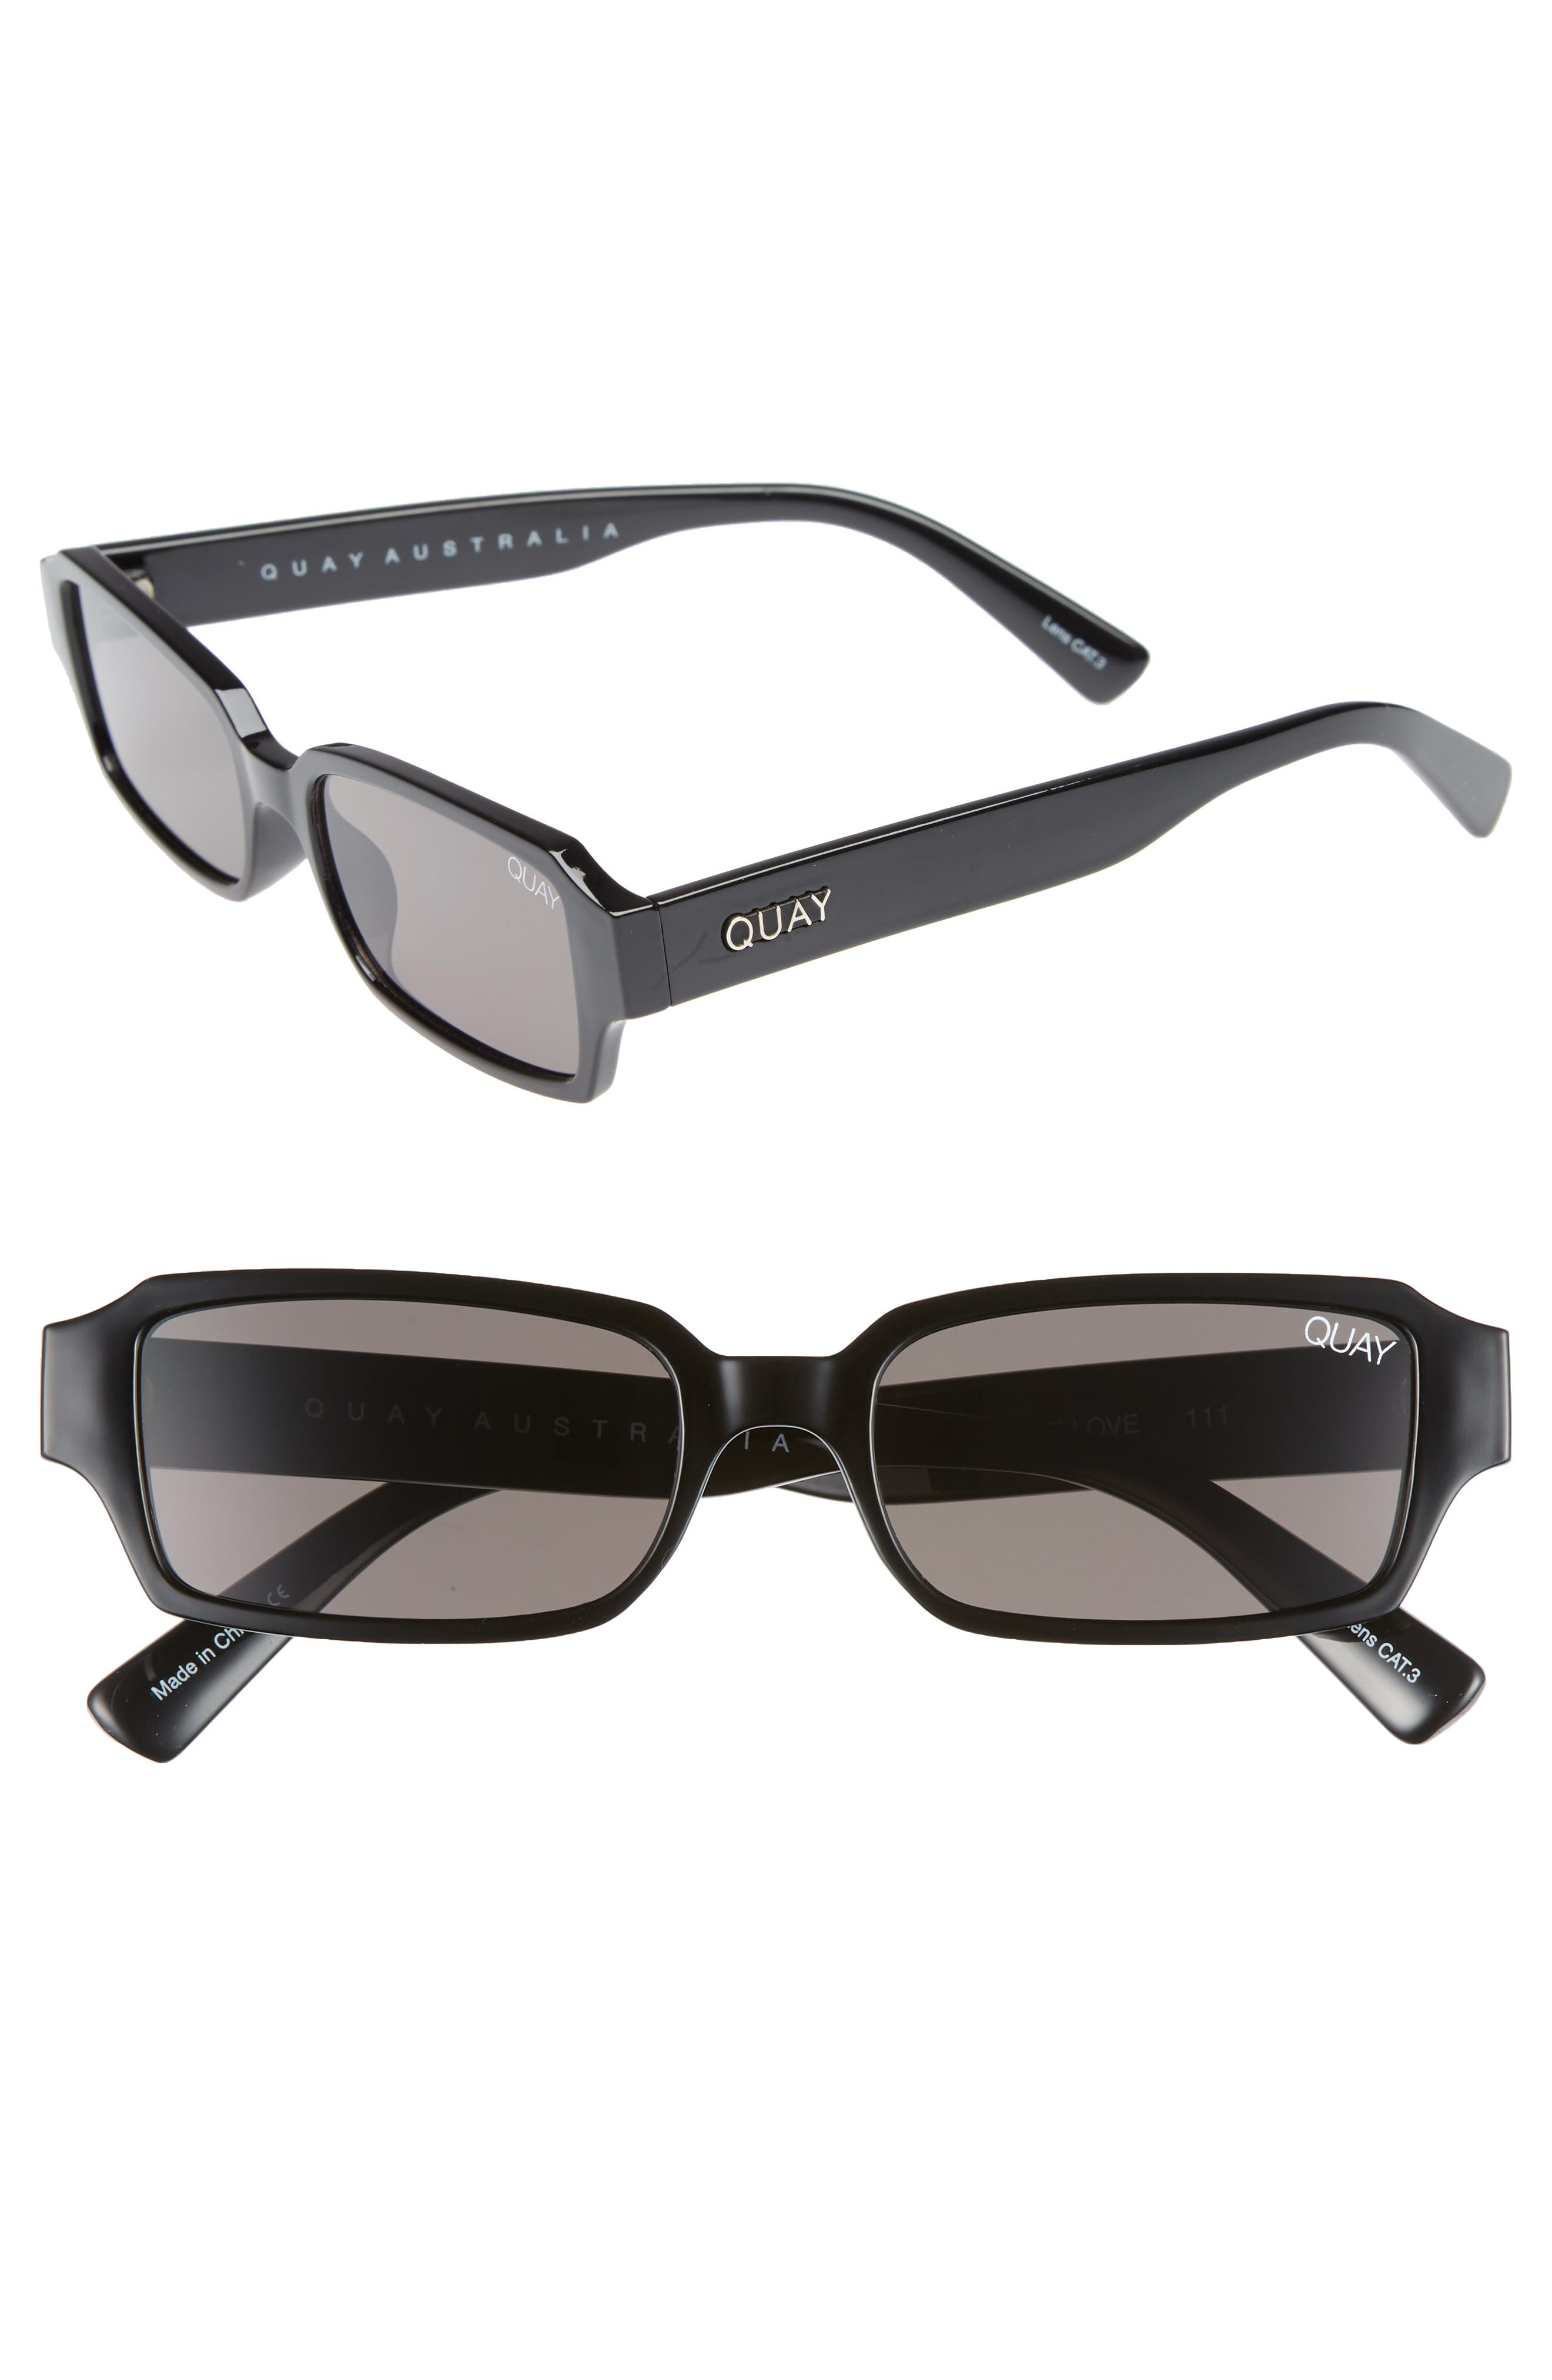 d89b7e94d3c Quay Australia Strange Love 5m Rectangle Sunglasses - Black  Smoke